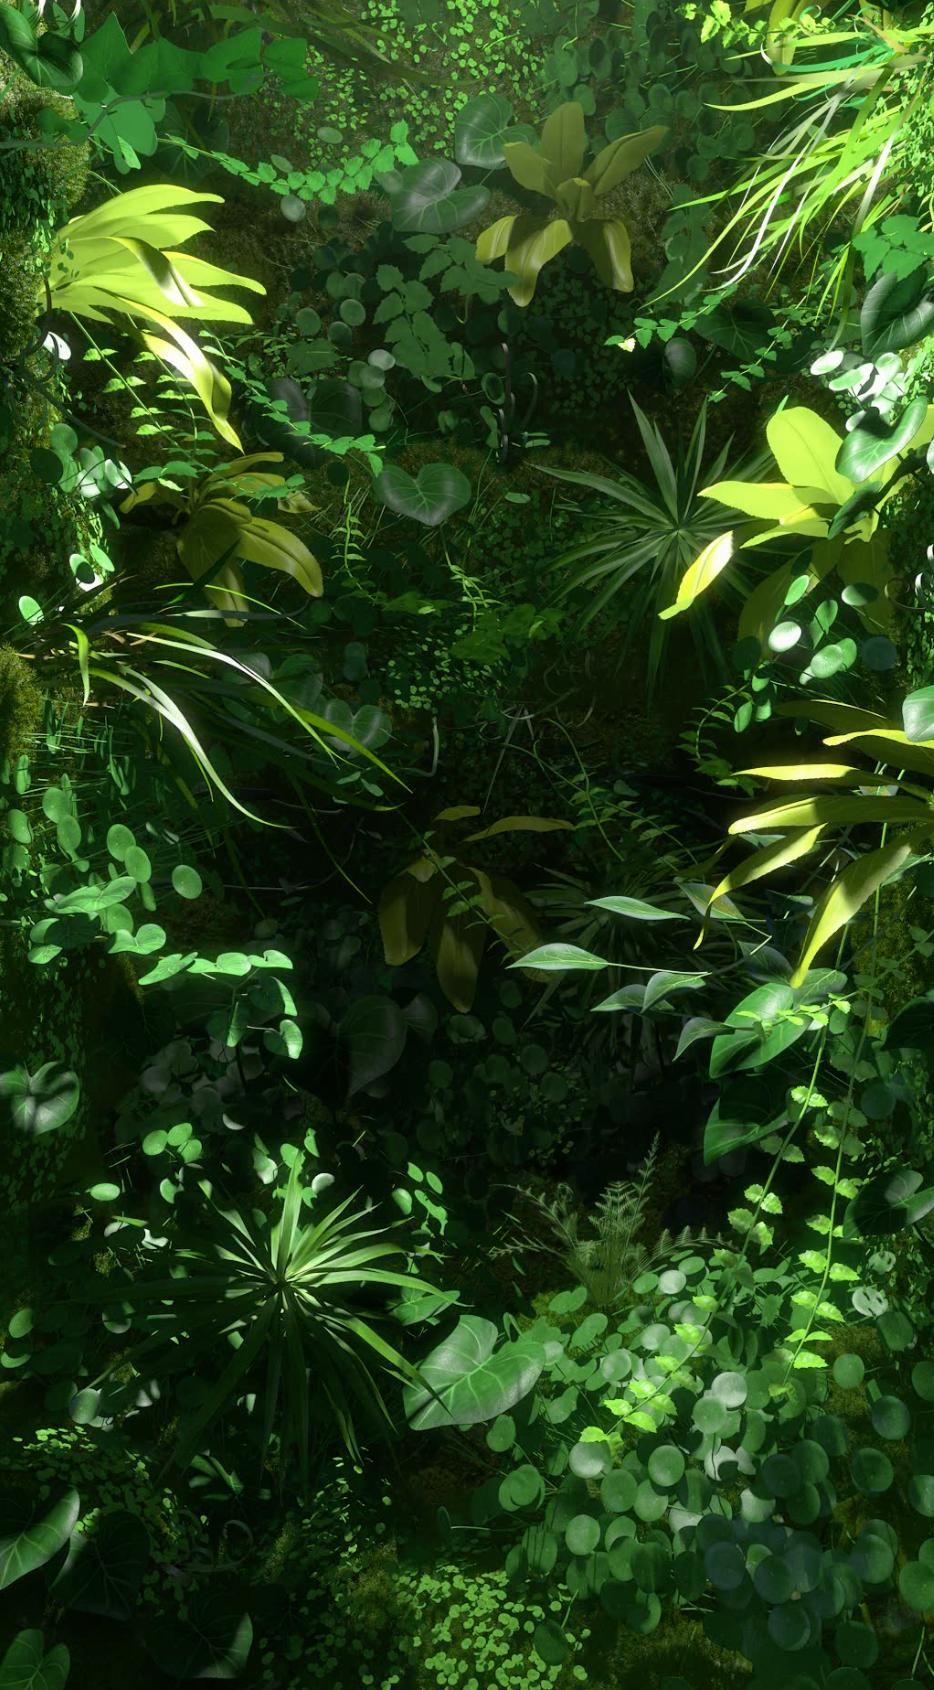 Eelco Brand, PT.movi (Ausschnitt), HD digitale Animation, 2018